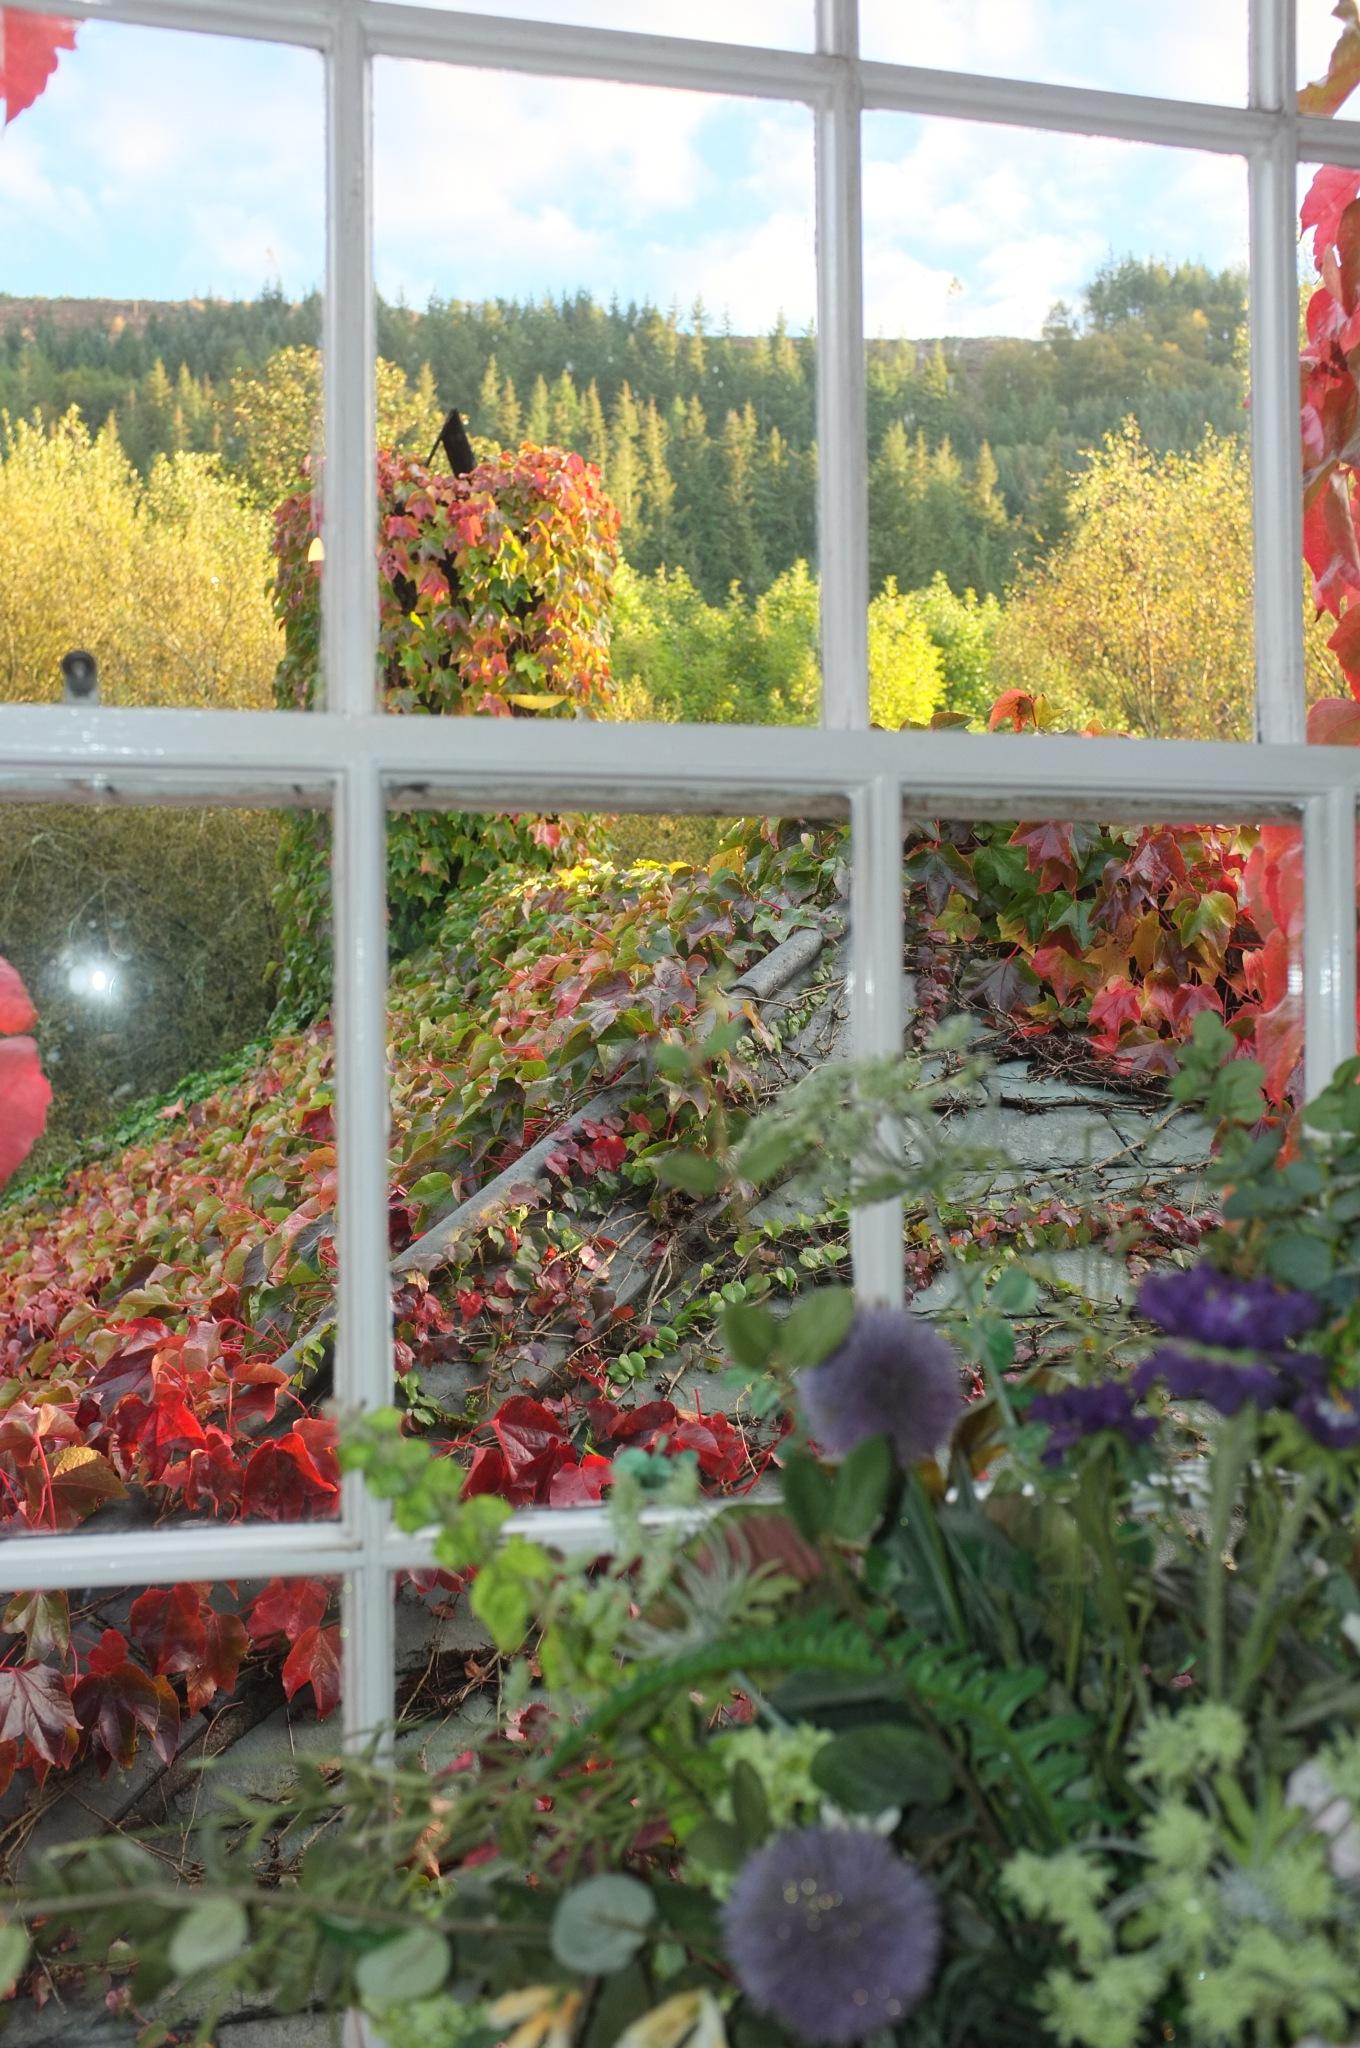 Through the Window...080601 by Michael jjg